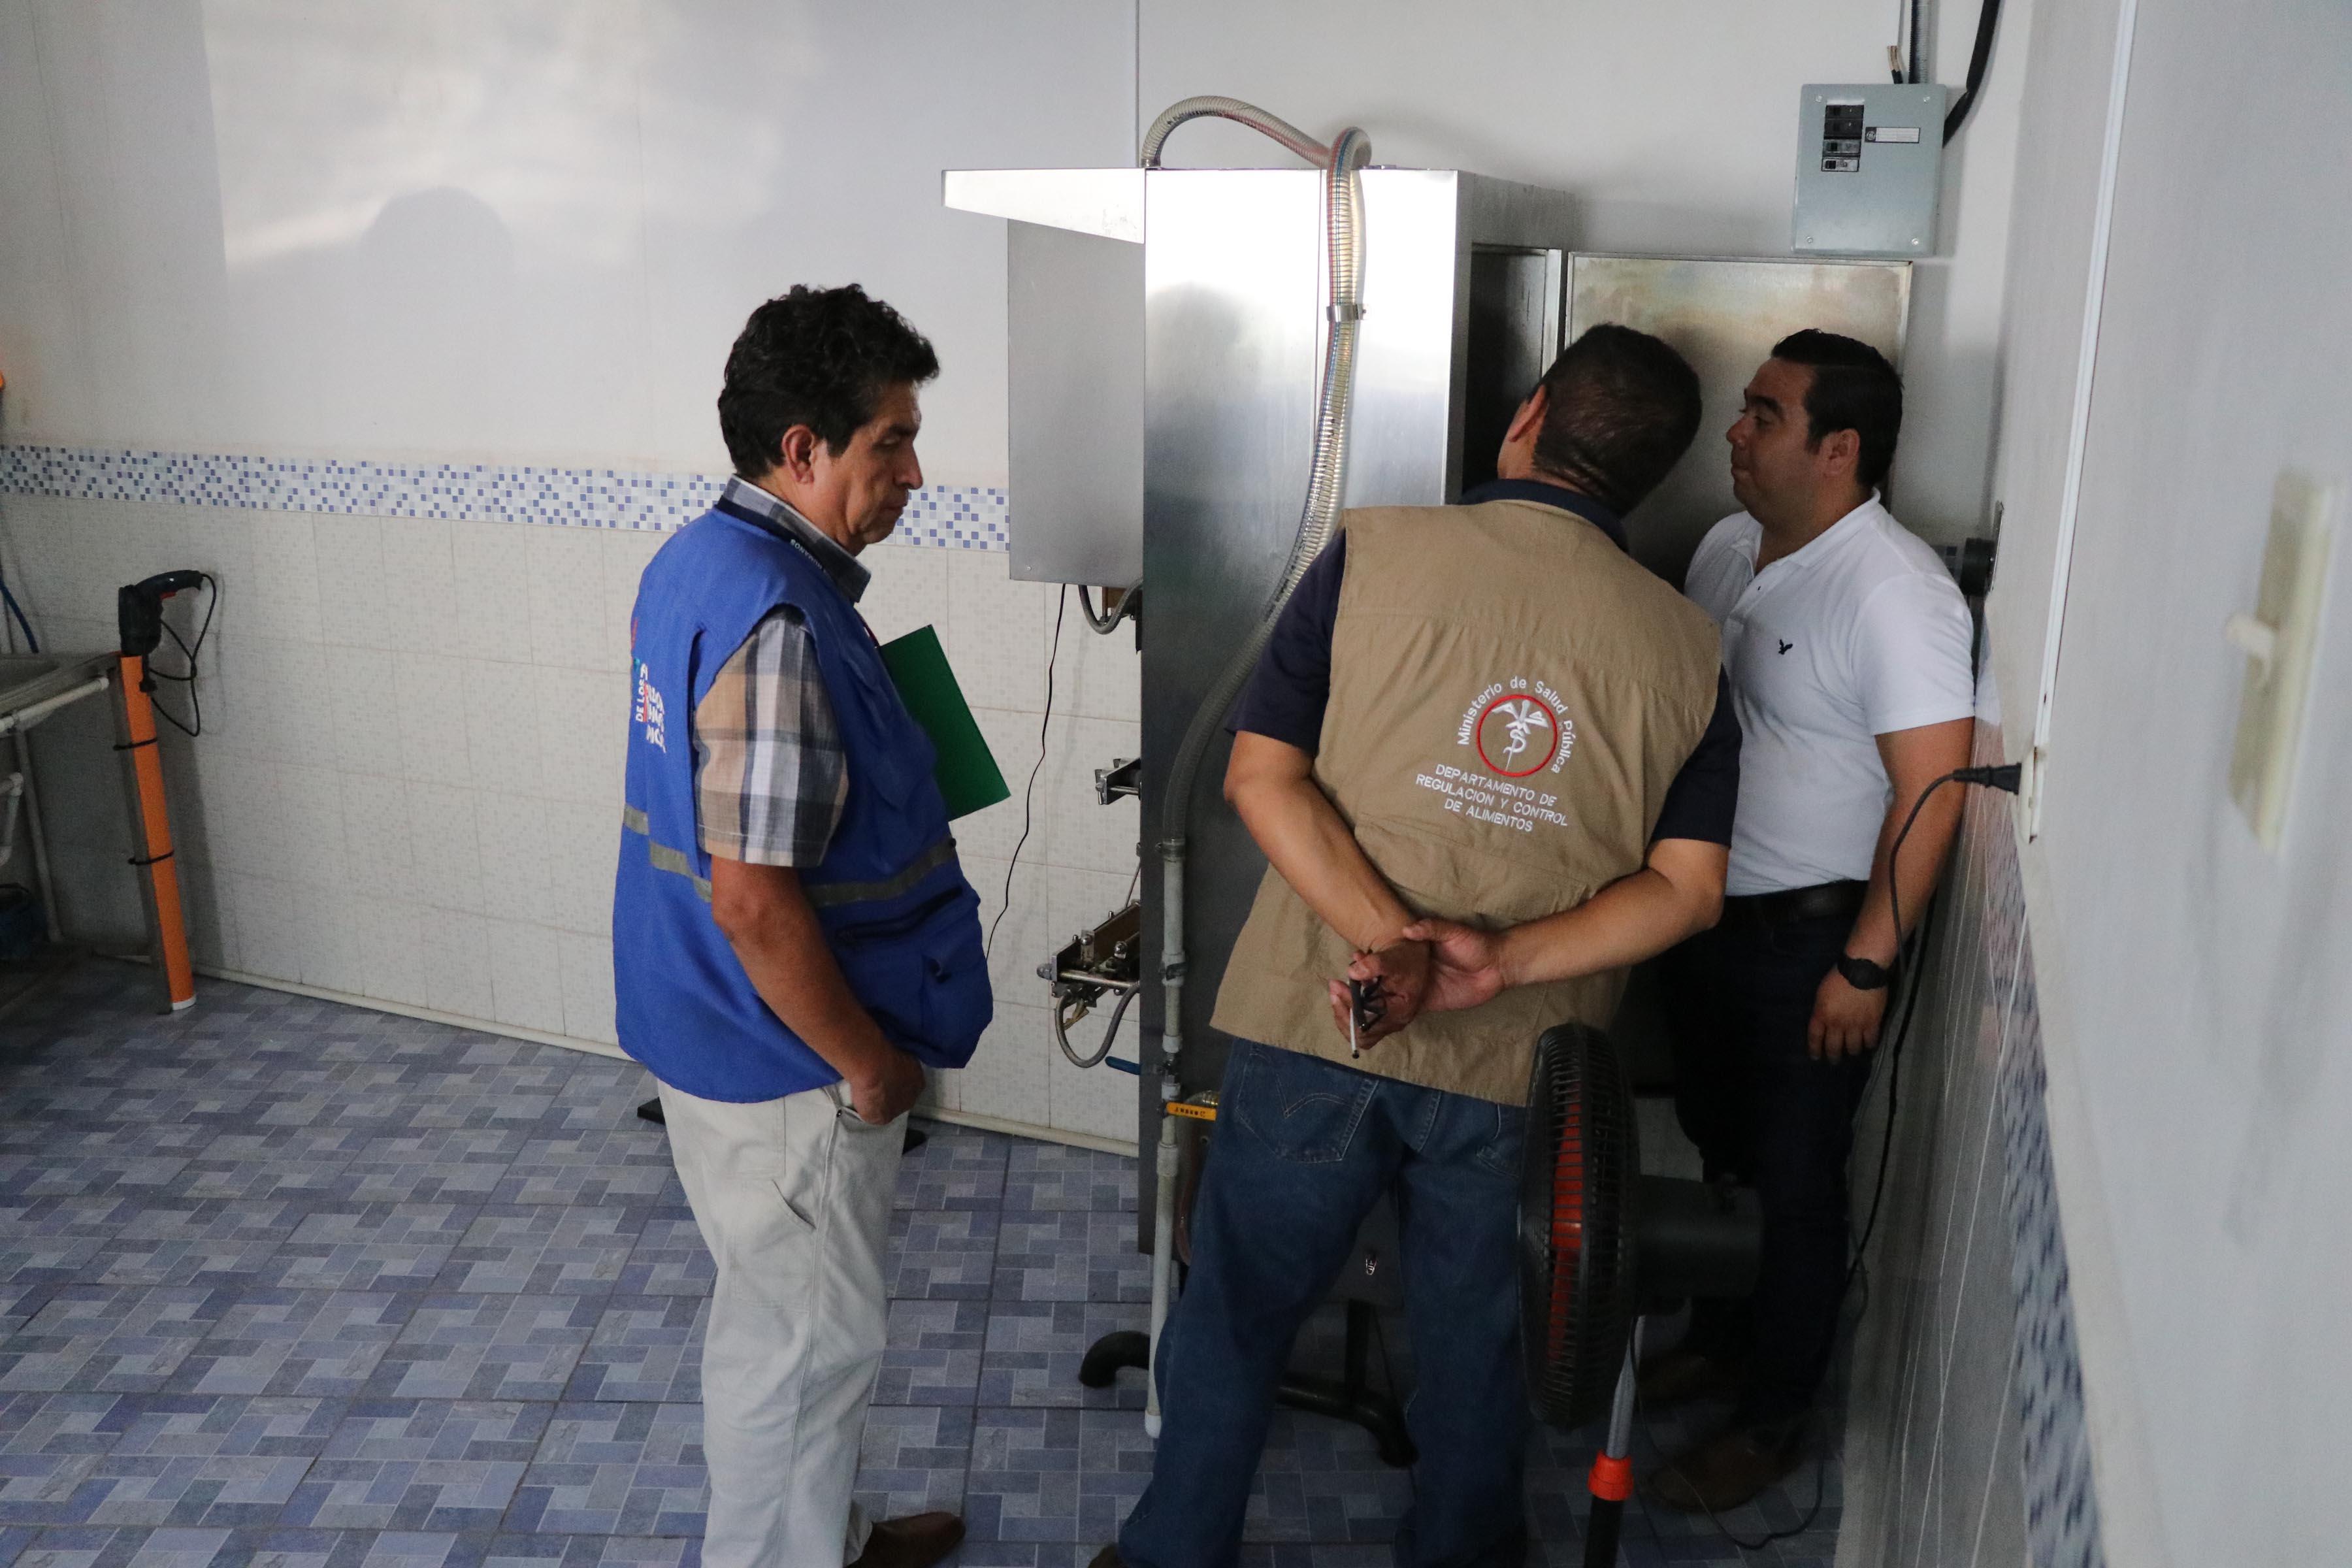 Comitiva efectúa supervisión de equipo y licencias en empresas que venden agua envasada en Escuintla. (Foto Prensa Libre: Enrique Paredes).